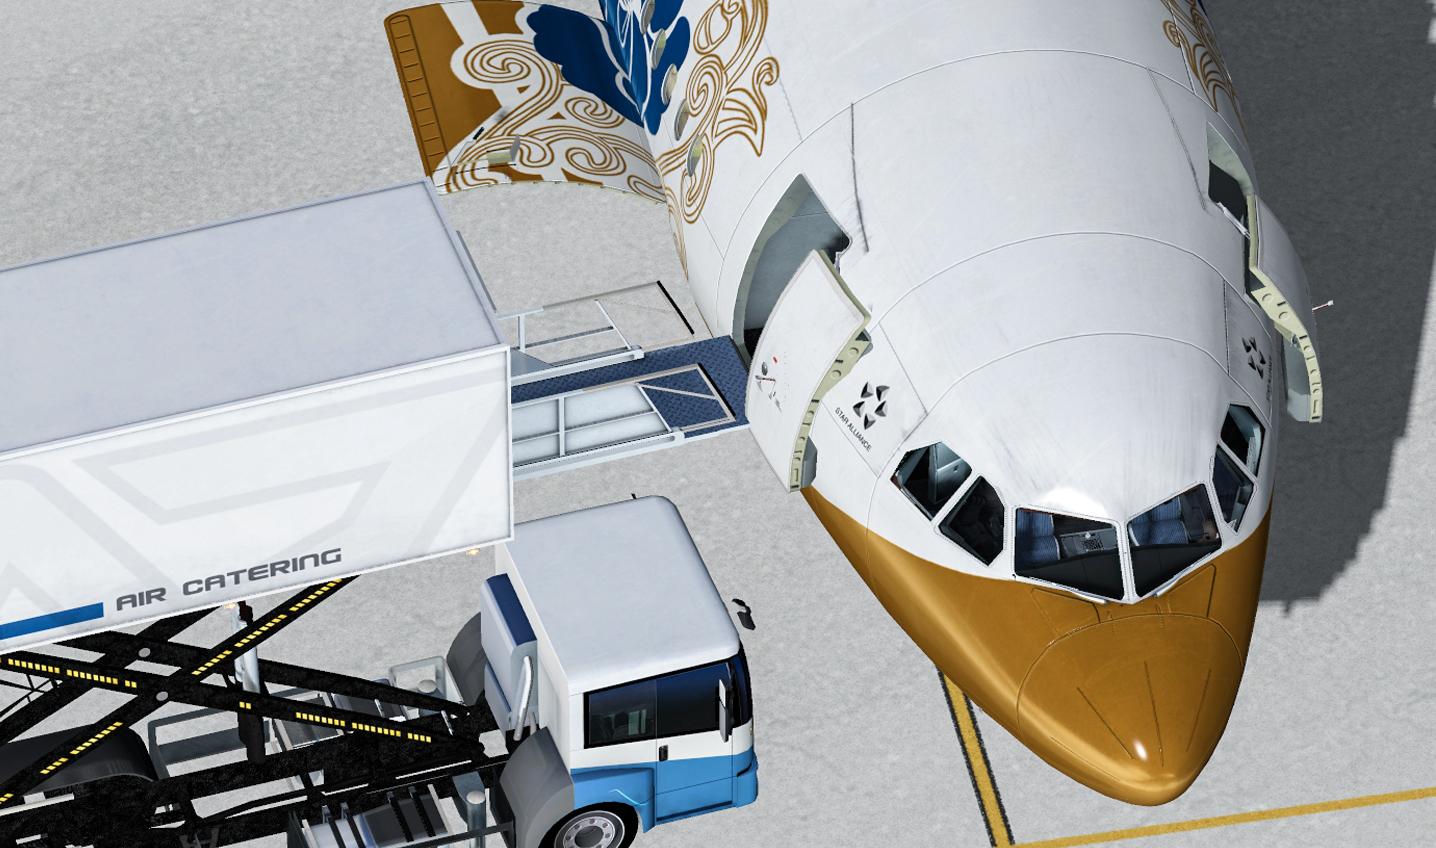 JarDesign Airbus A330-243 (Windows Only) - Ariel Creation